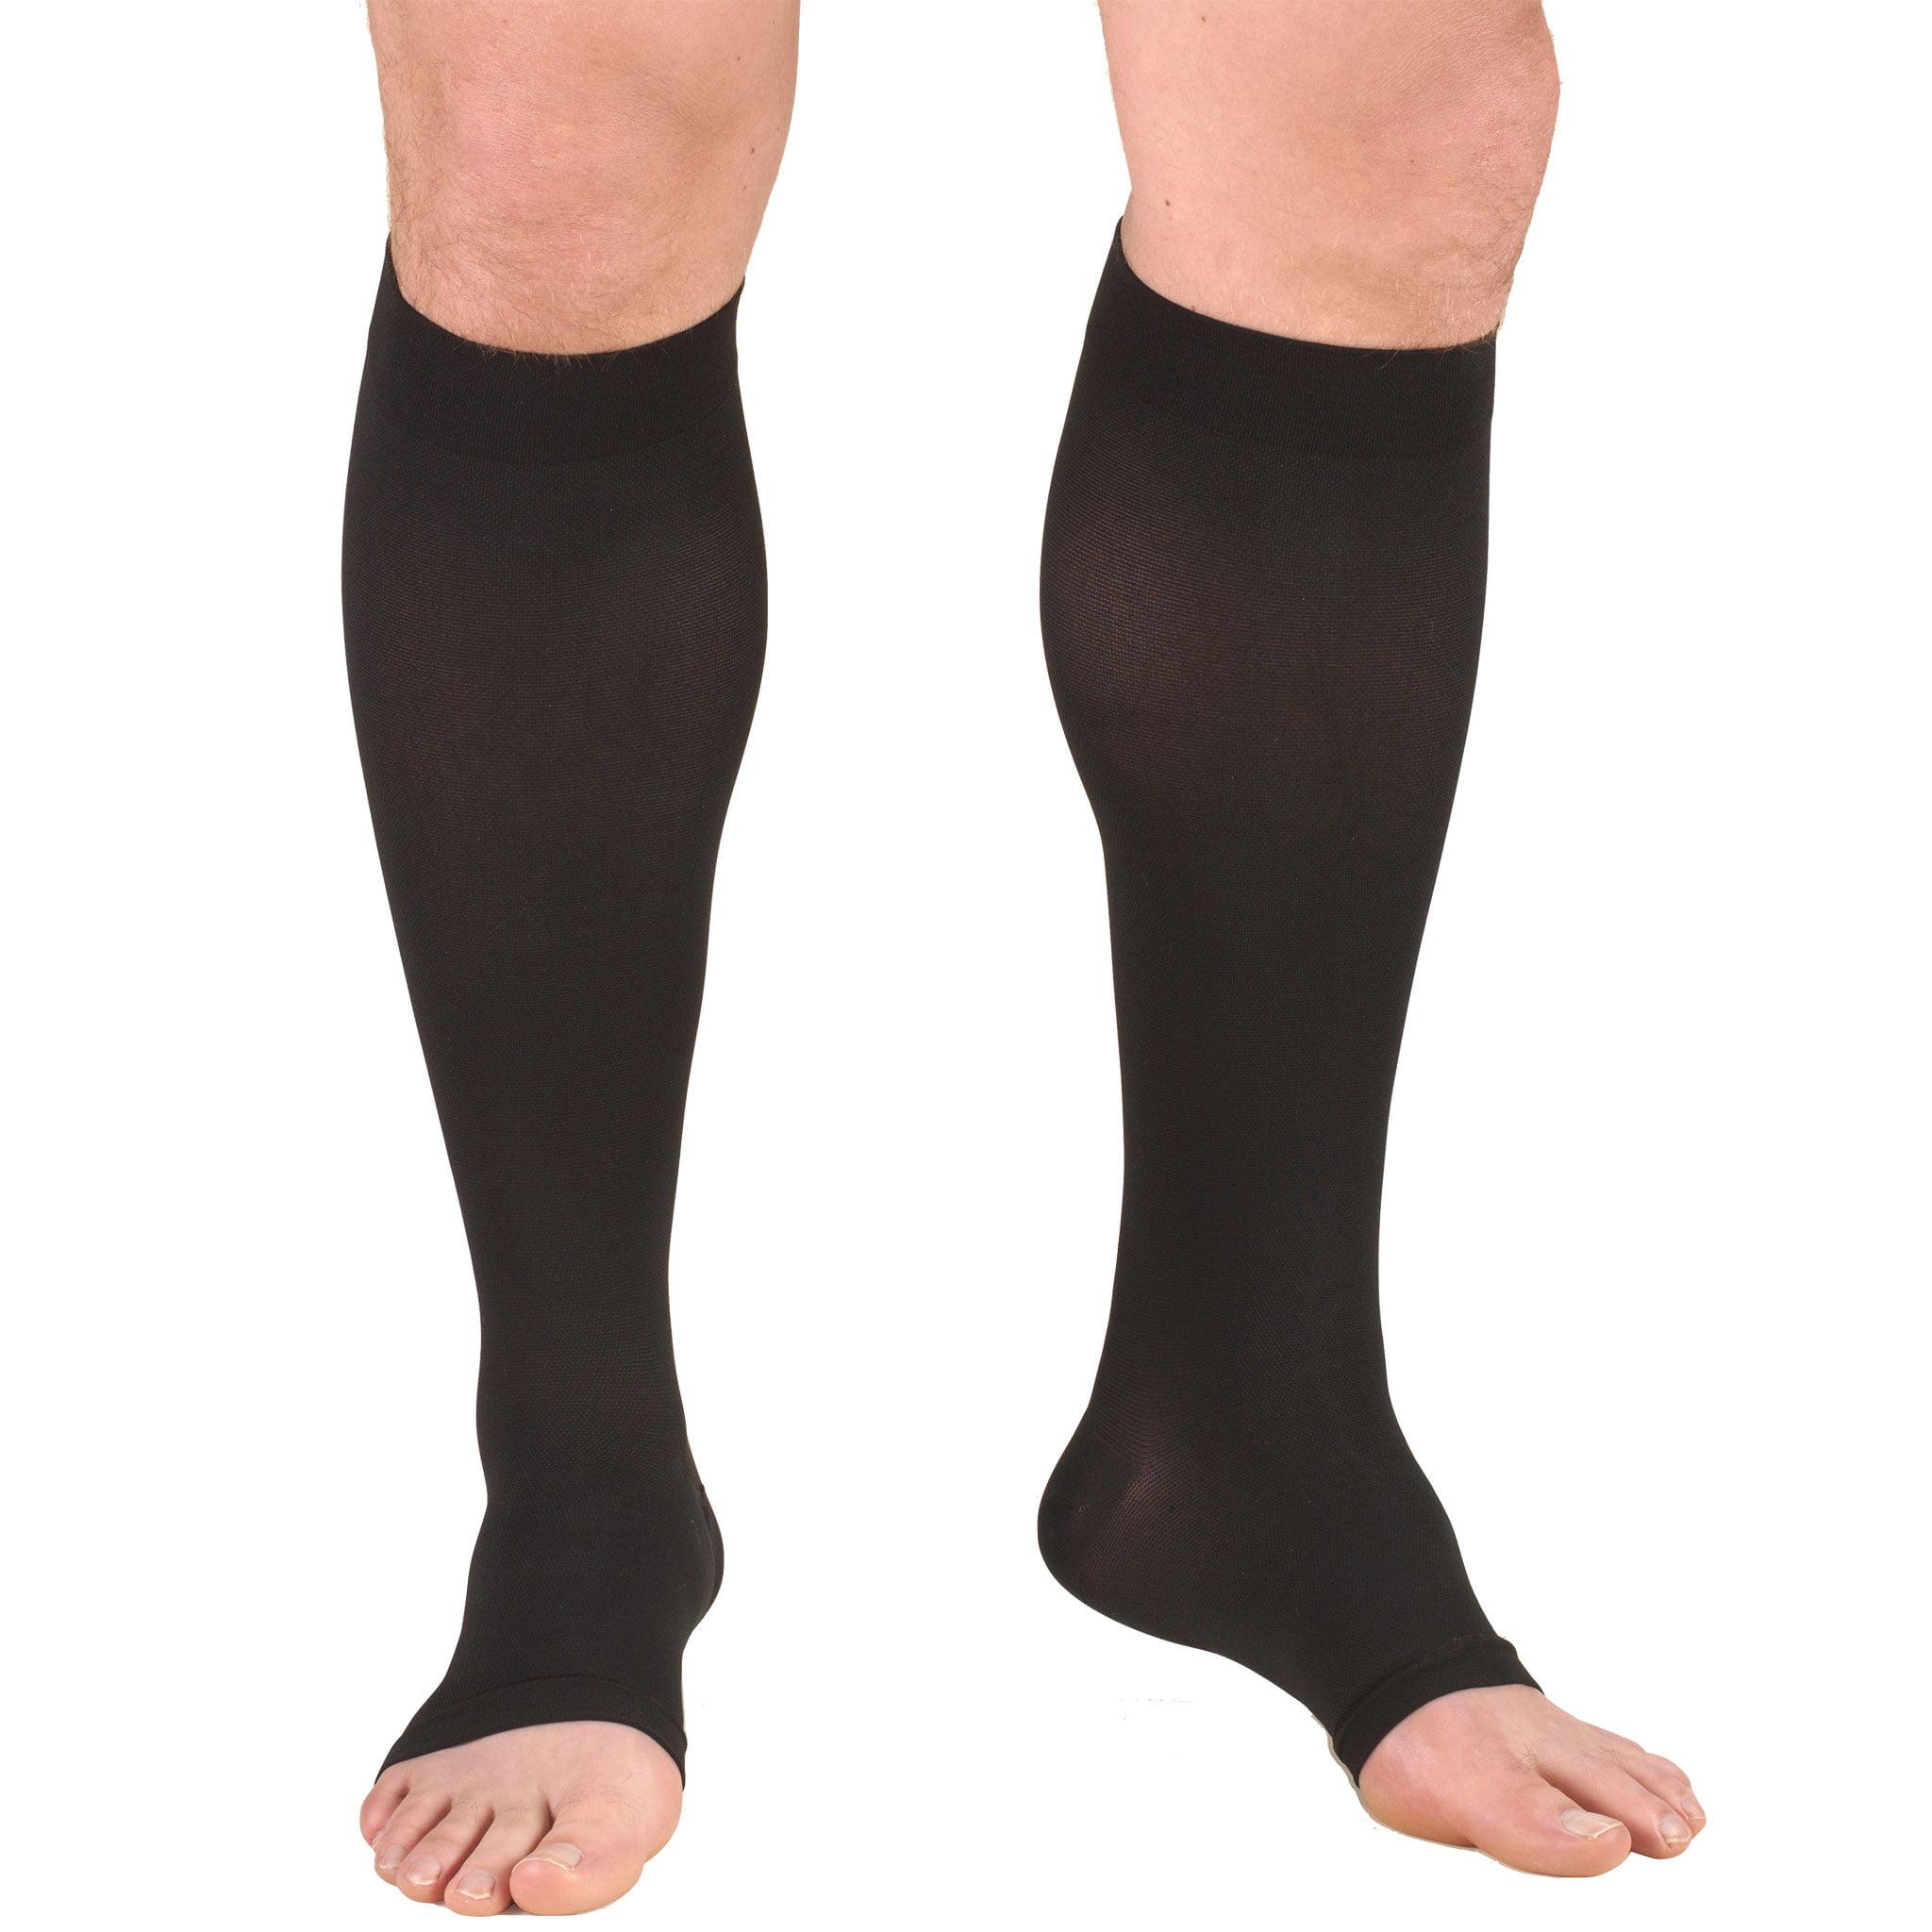 Truform Stockings, Knee High, Open Toe: 30-40 mmHg, Black, 3X-Large